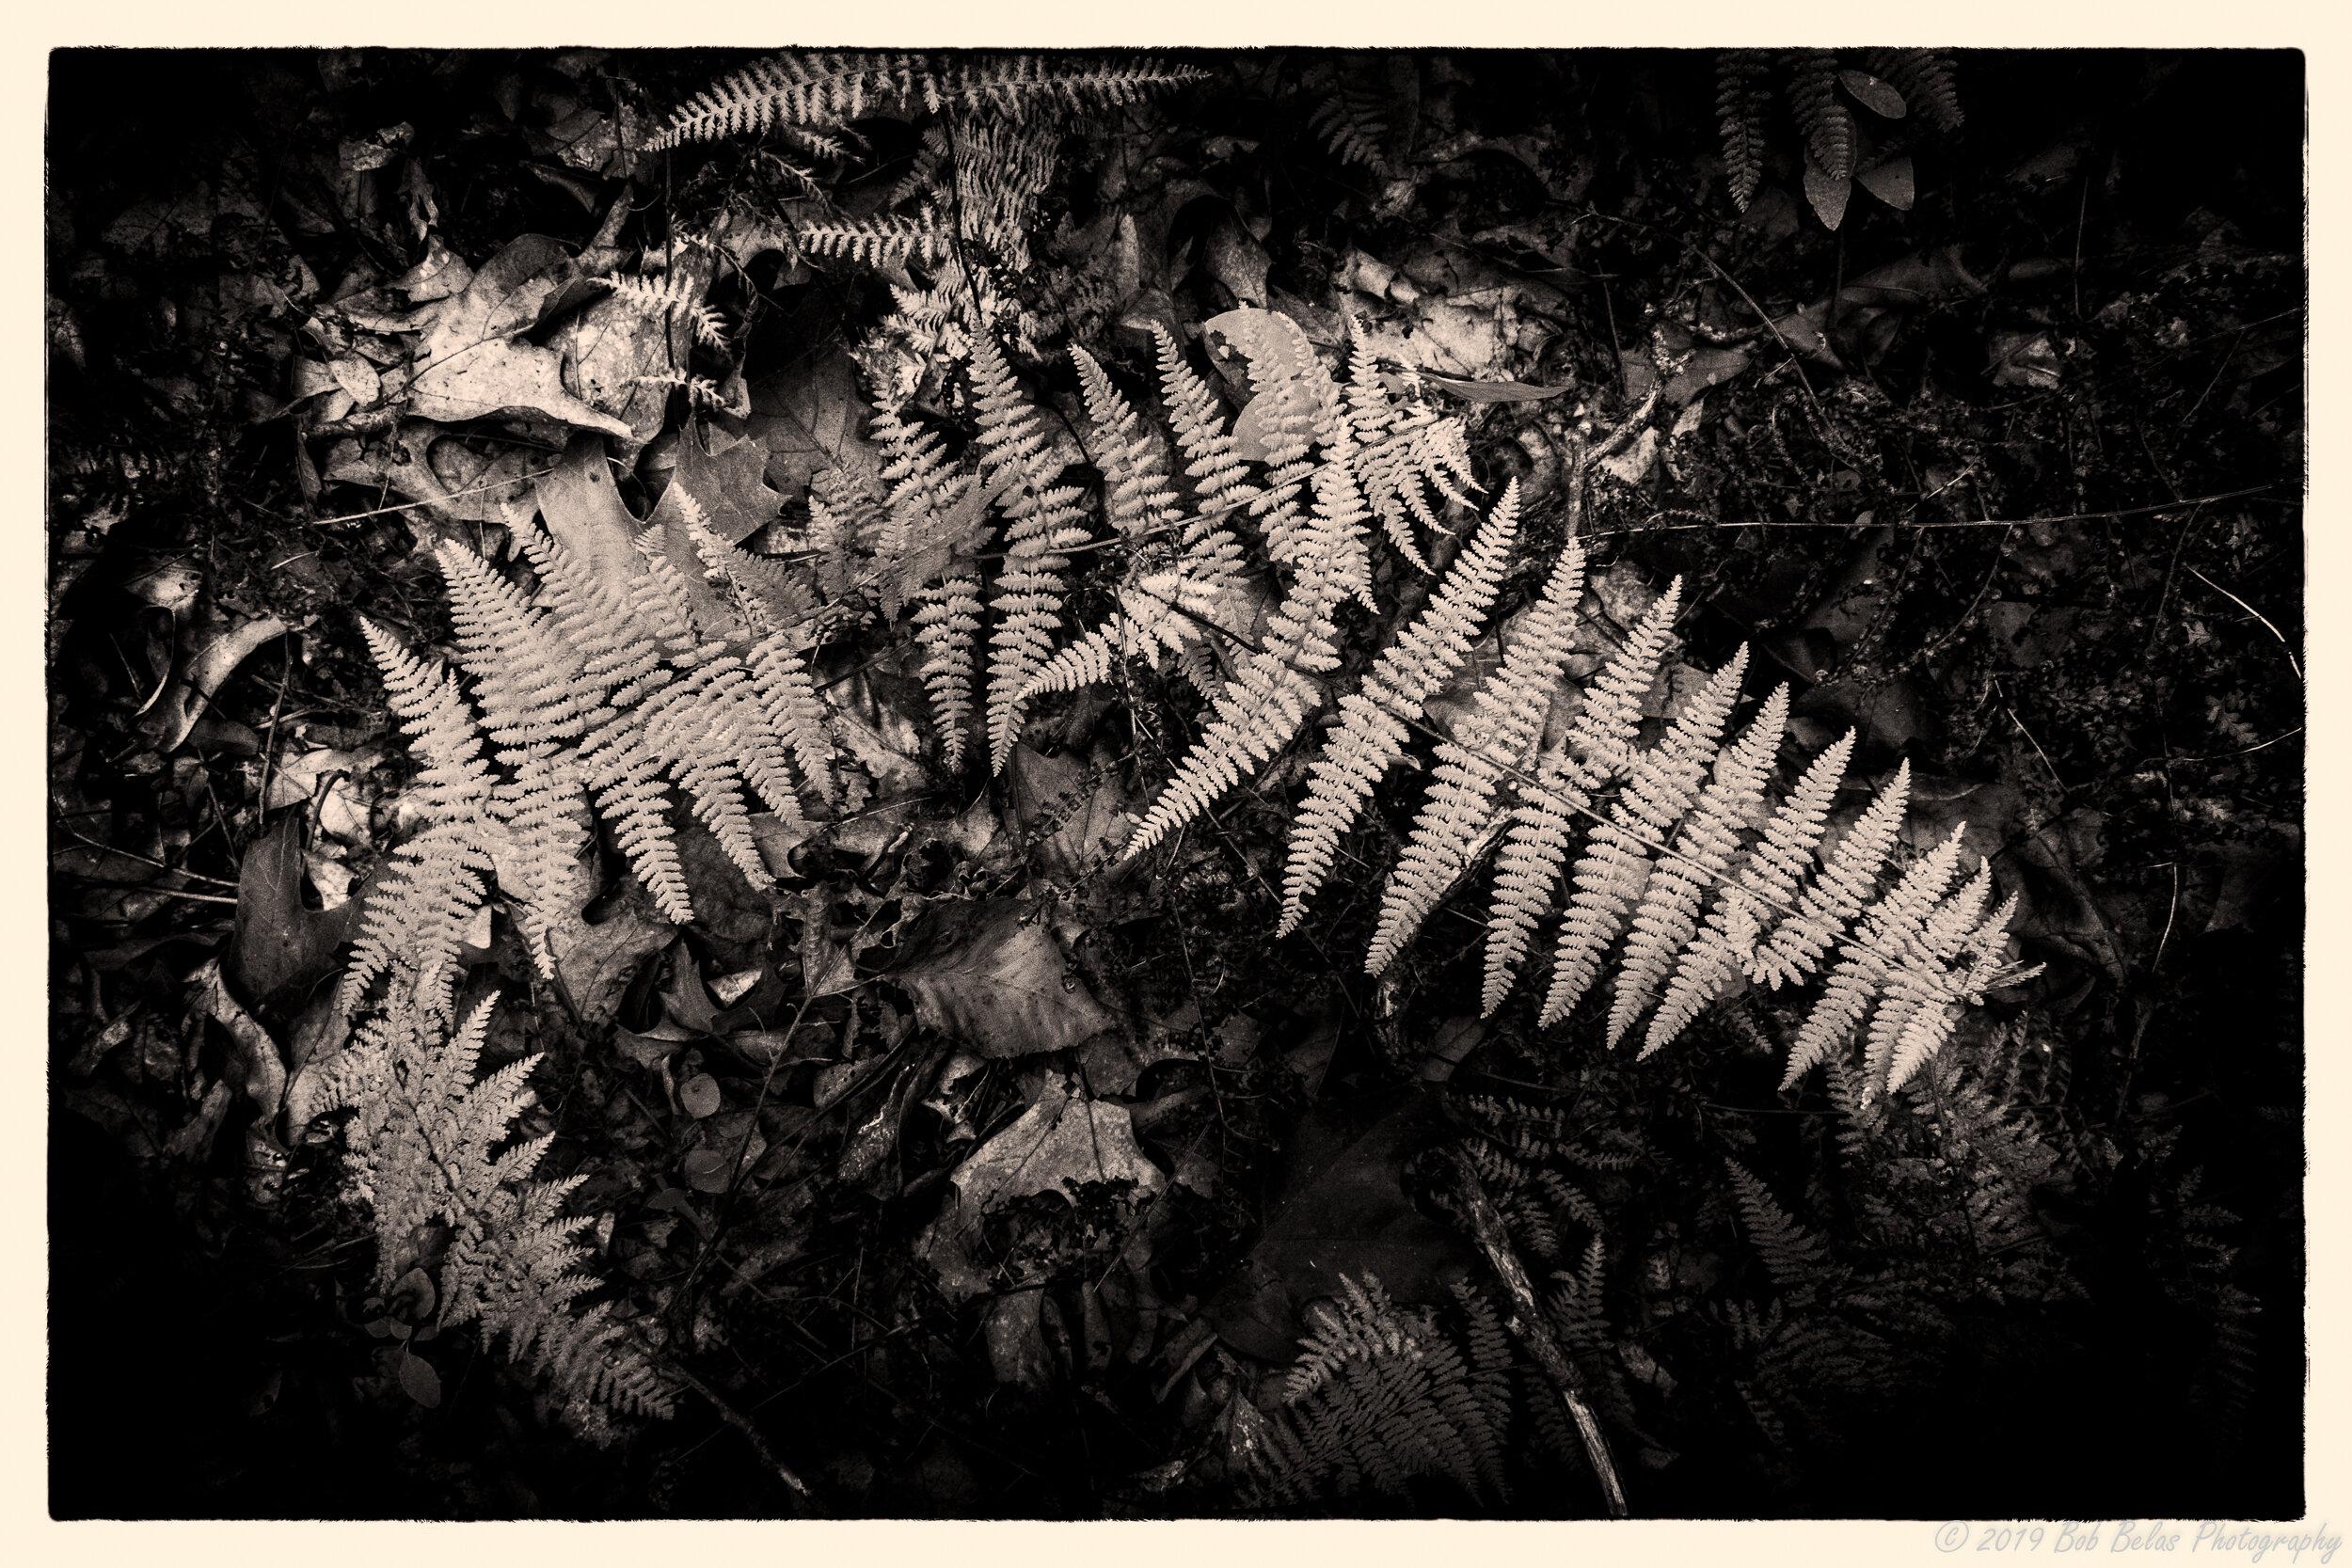 Ferns at dusk 2, monochrome